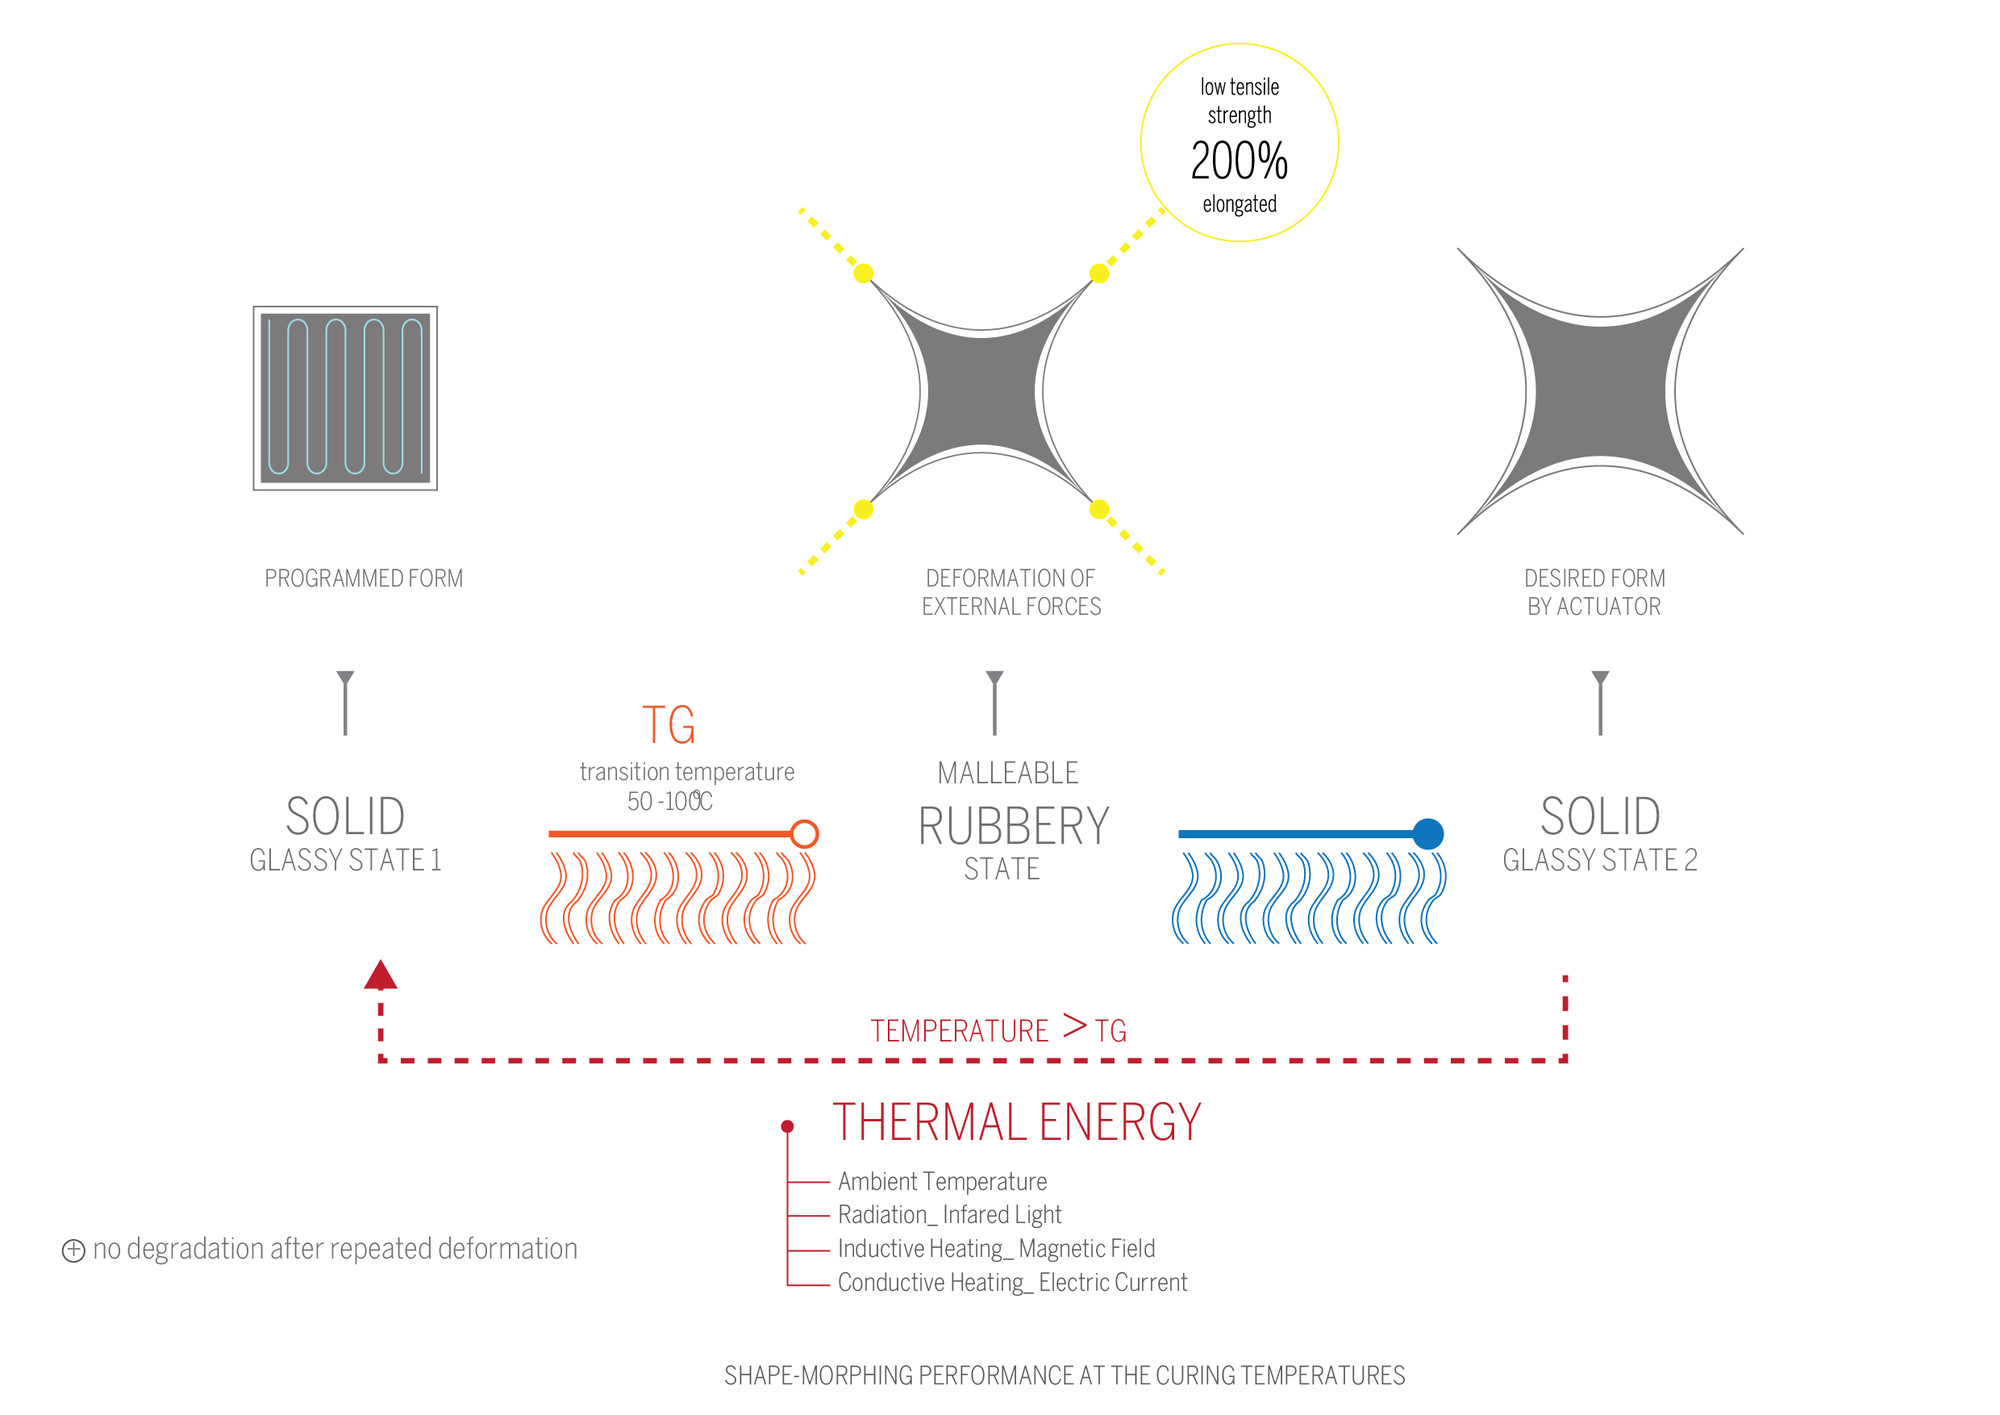 Diagrama Sistema de Materiales. Image Cortesia de © IaaC (Instituto de Aquitectura Avanzada de Catalunya) / Ece Tankal, Efilena Baseta, Ramin Shambayati